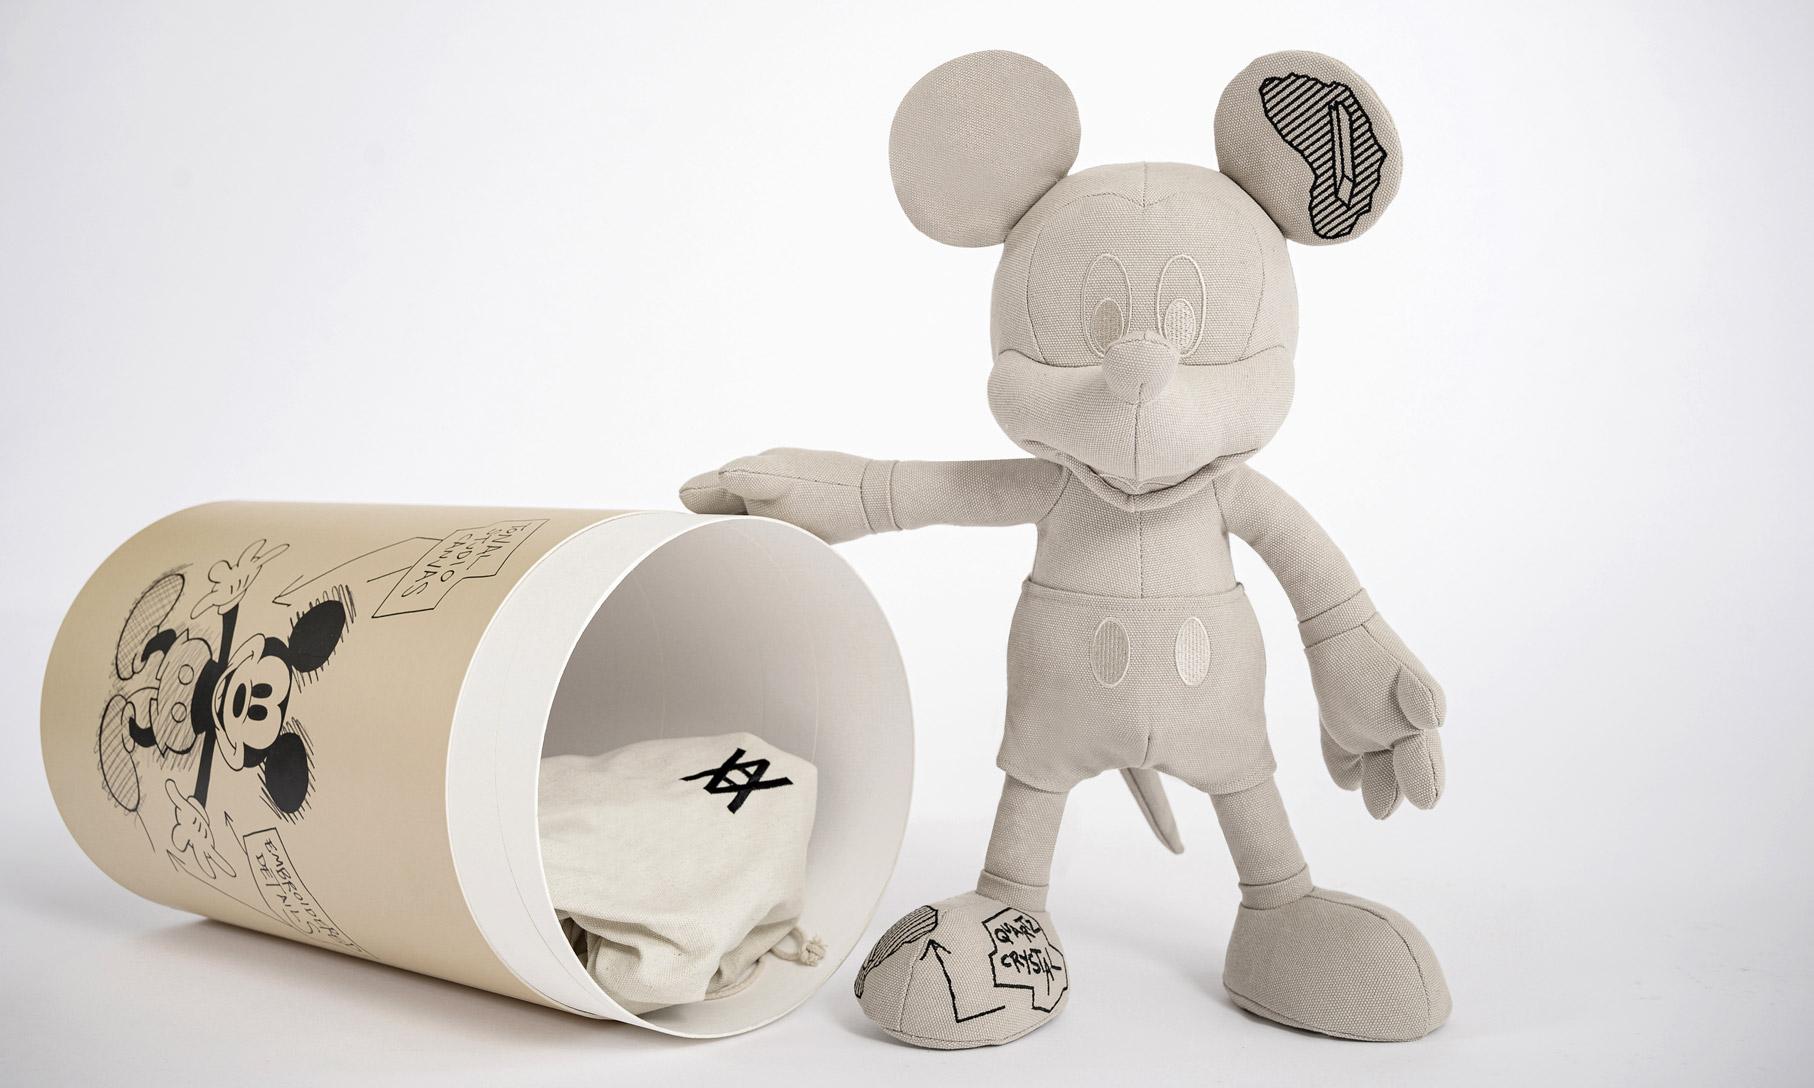 INNERSECT 首发,Disney x Daniel Arsham x APPortfolio 三方联名系列释出